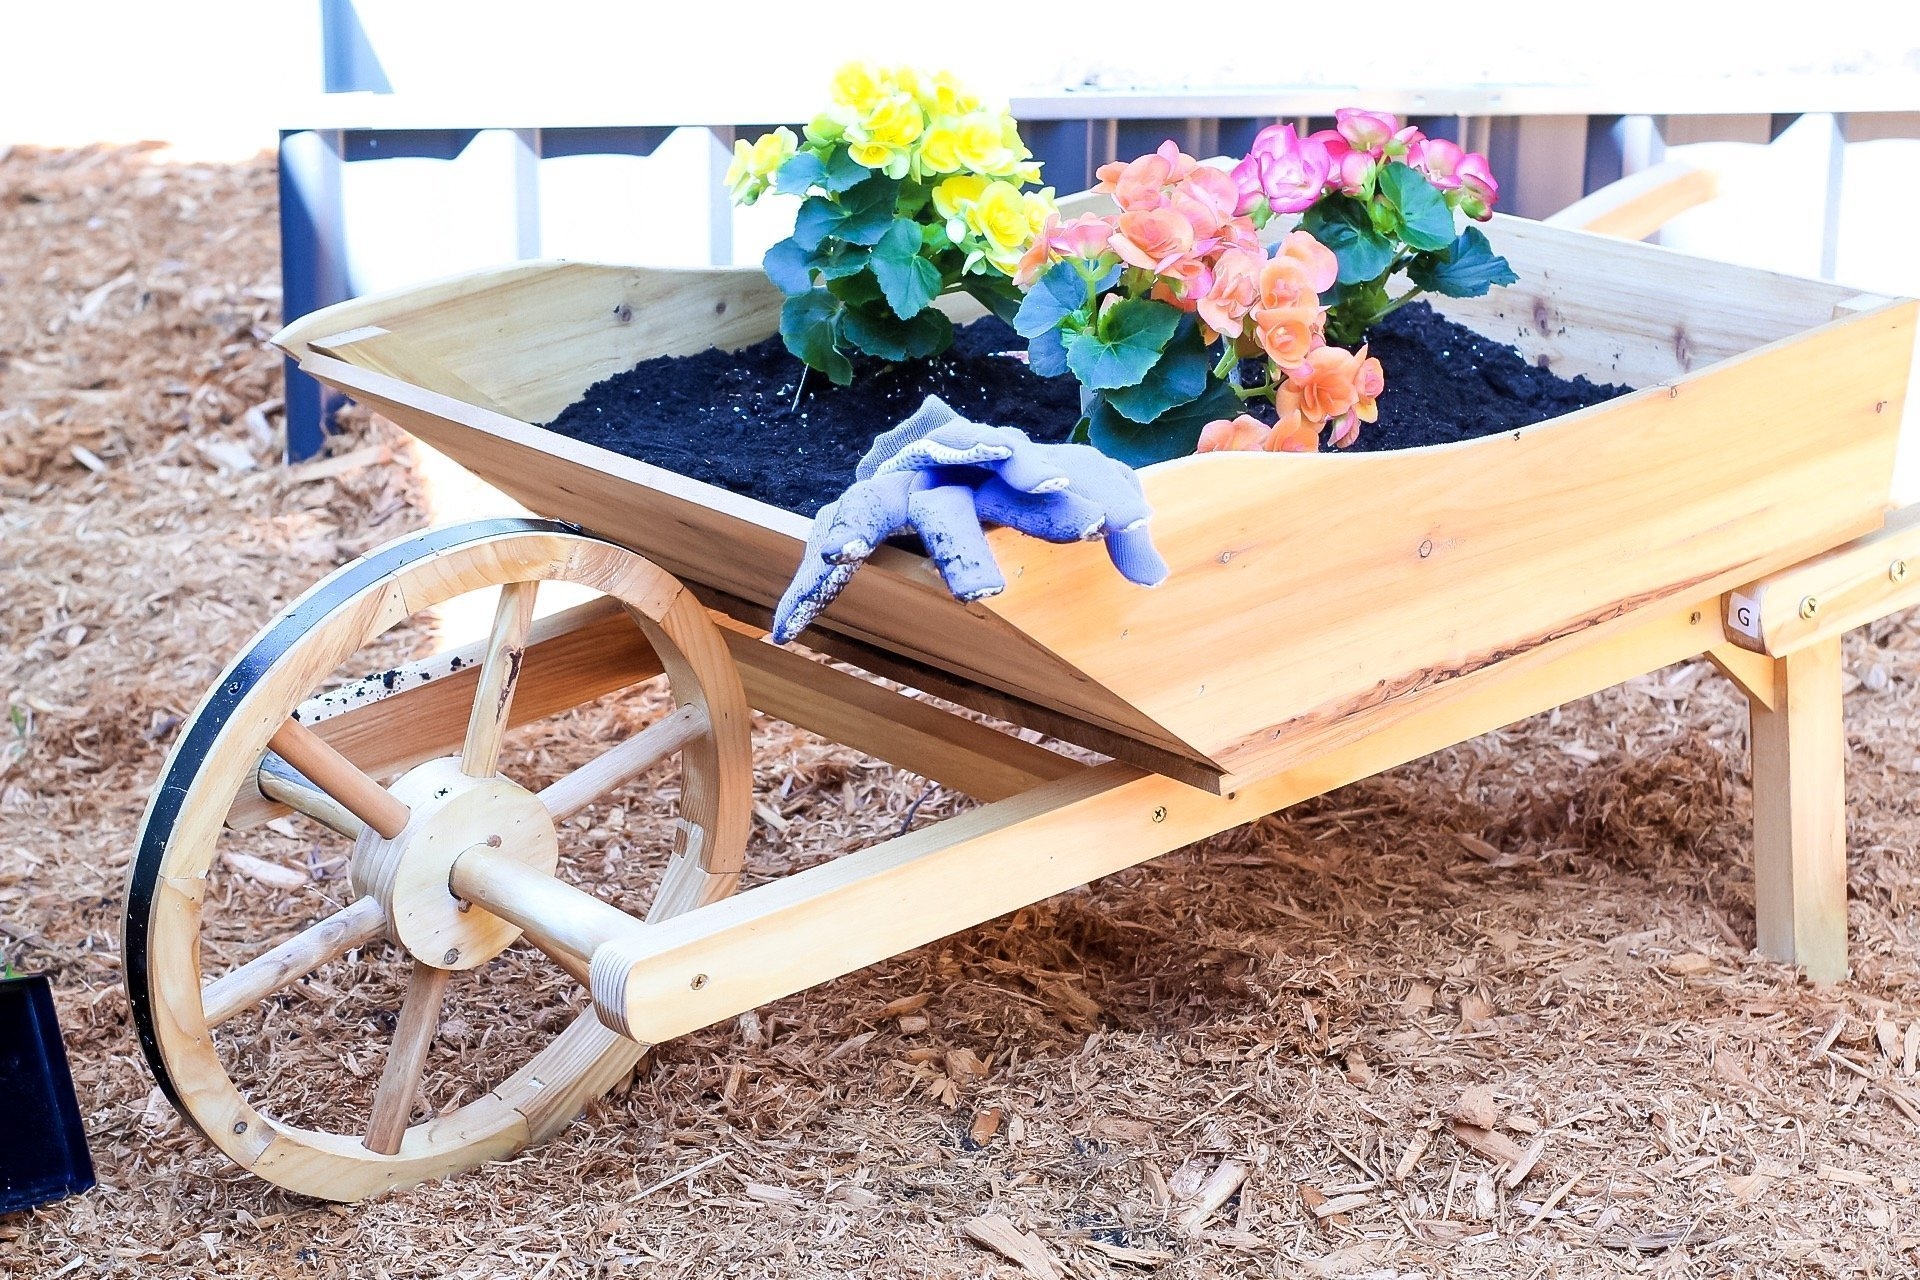 gardening tips - filling up the wheelbarrow